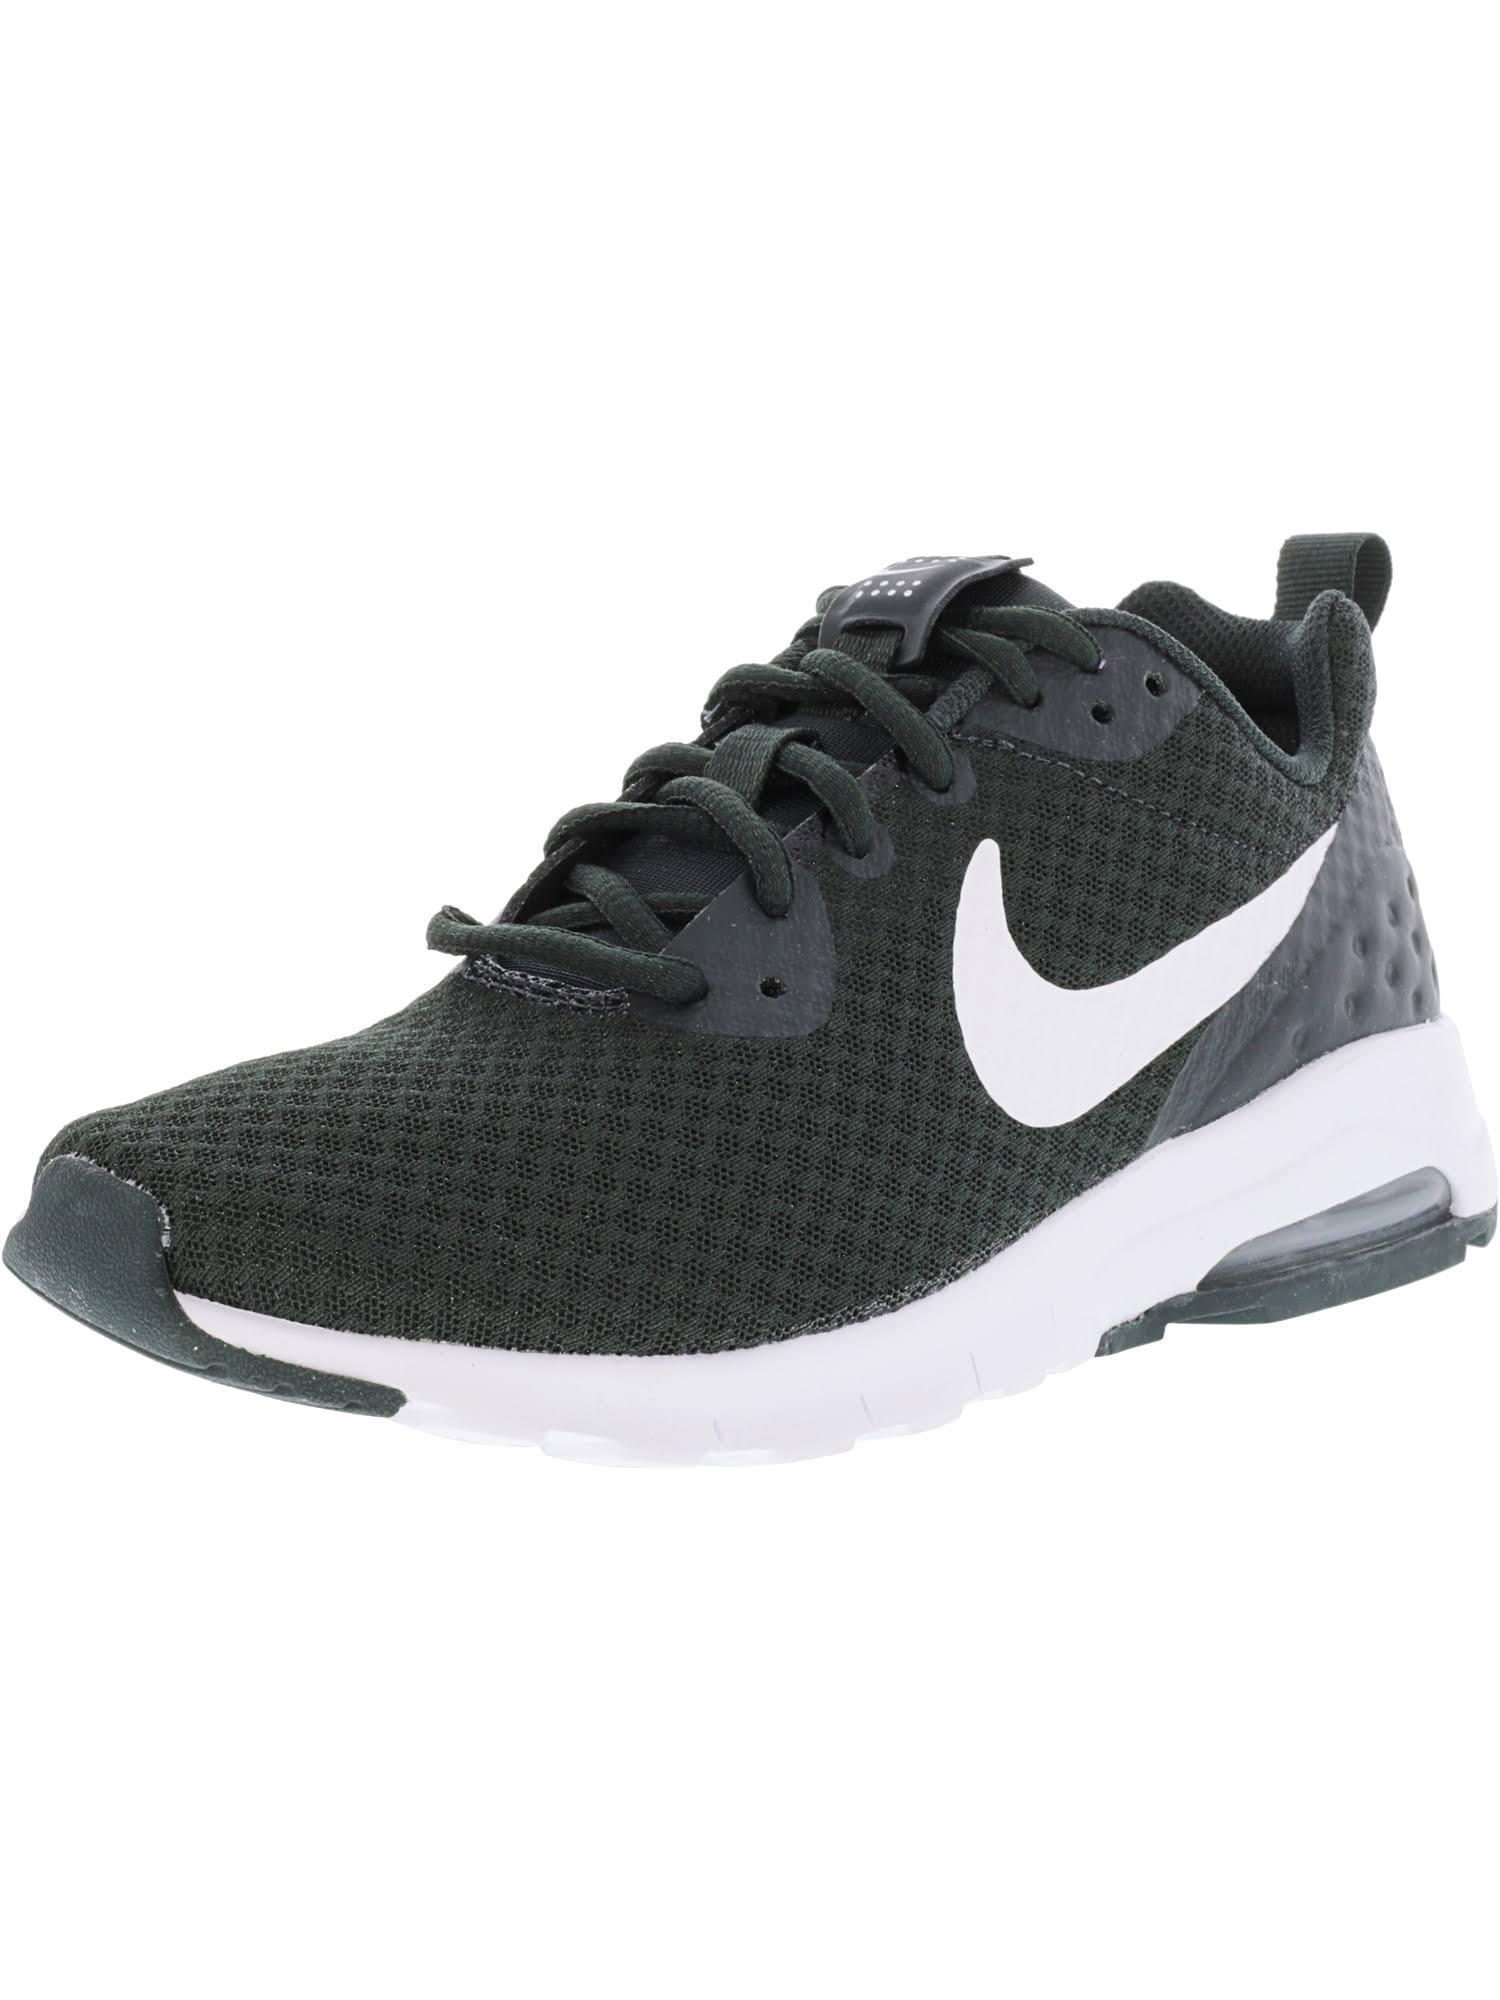 Trainers Damen Low Weiß Oudoor Air Max Motion Grün 40 Nike 5 q7I1wx